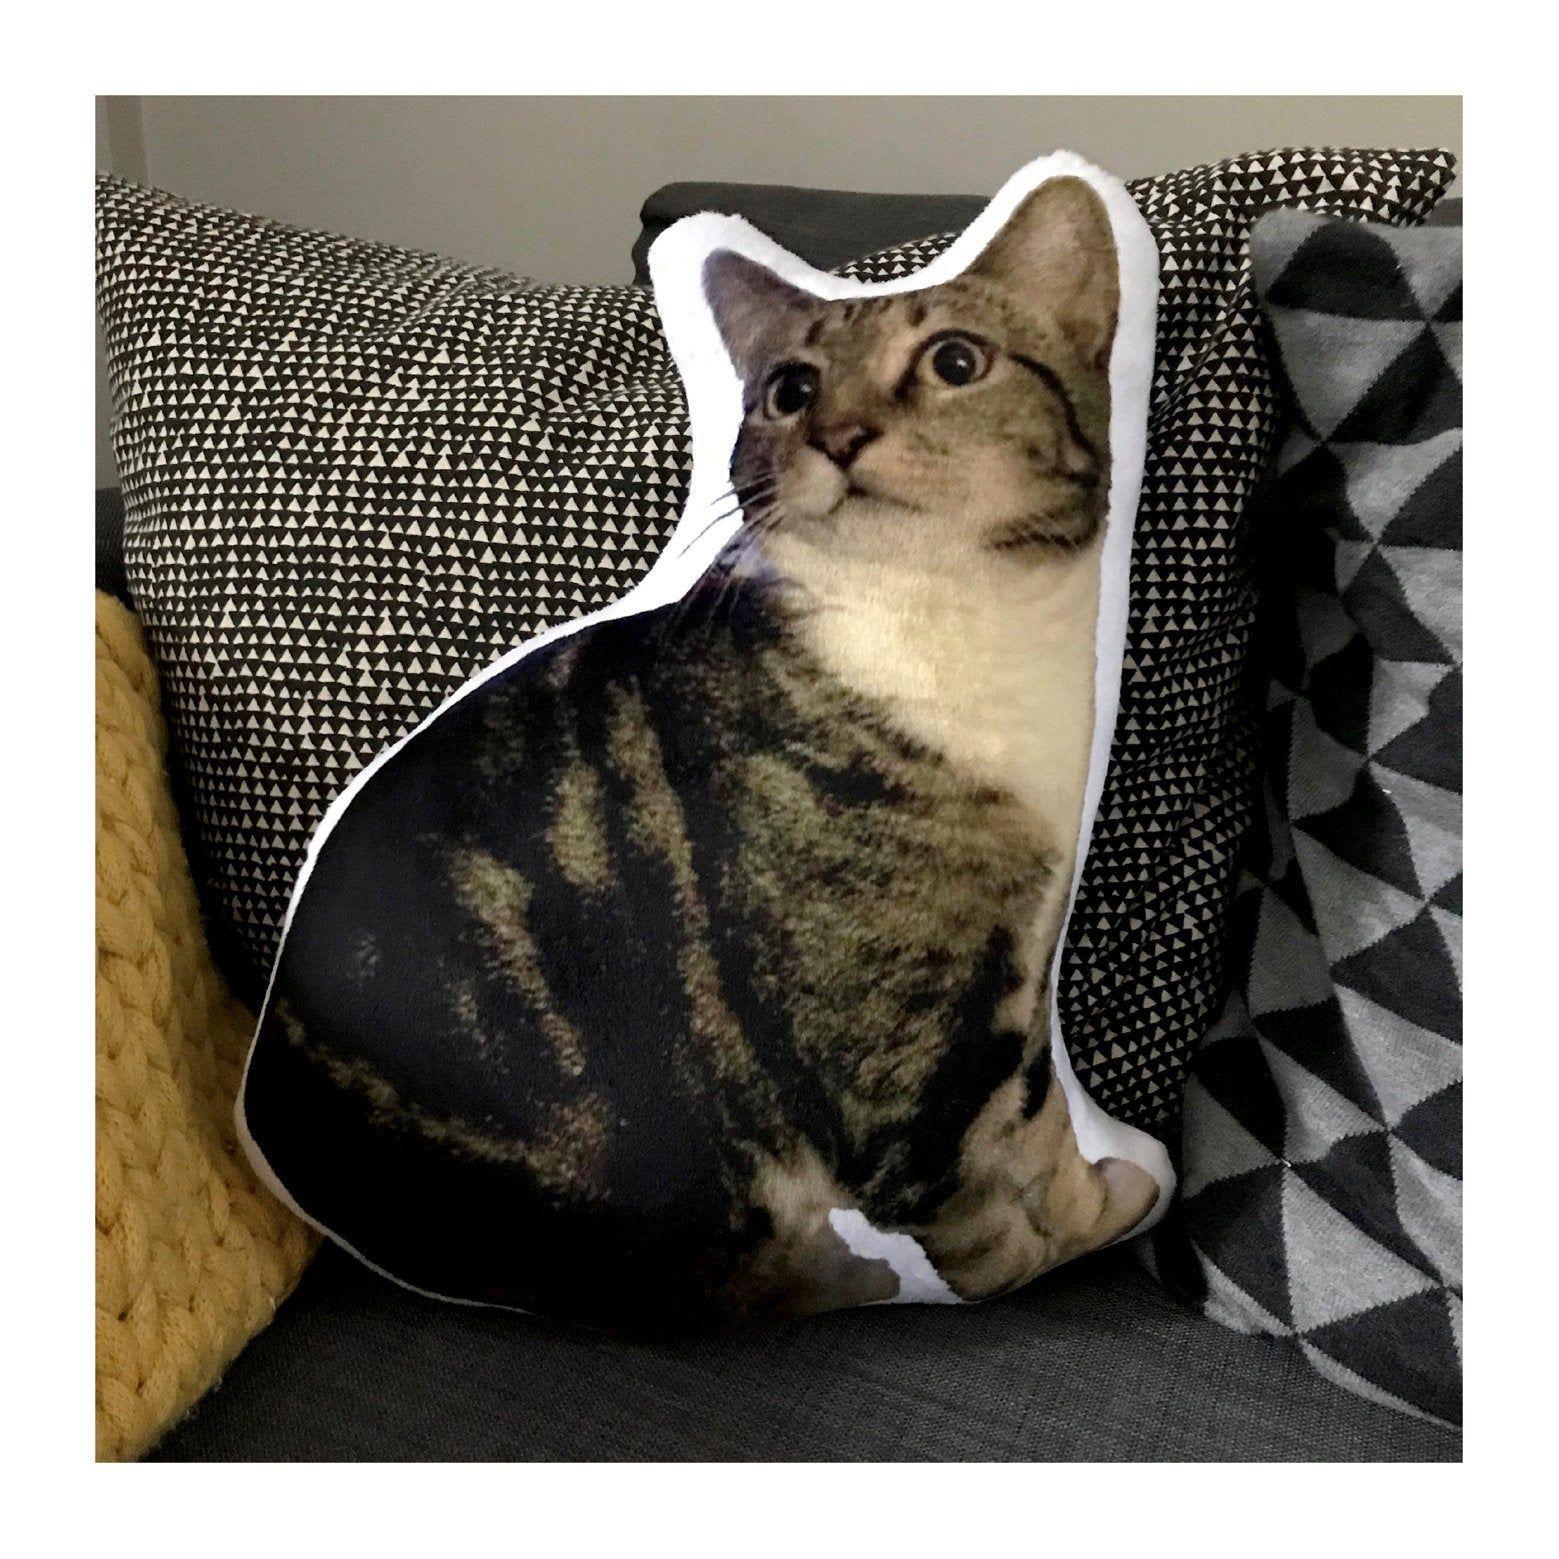 Fur fabric pet cushion Custom cat portrait pillow Photo